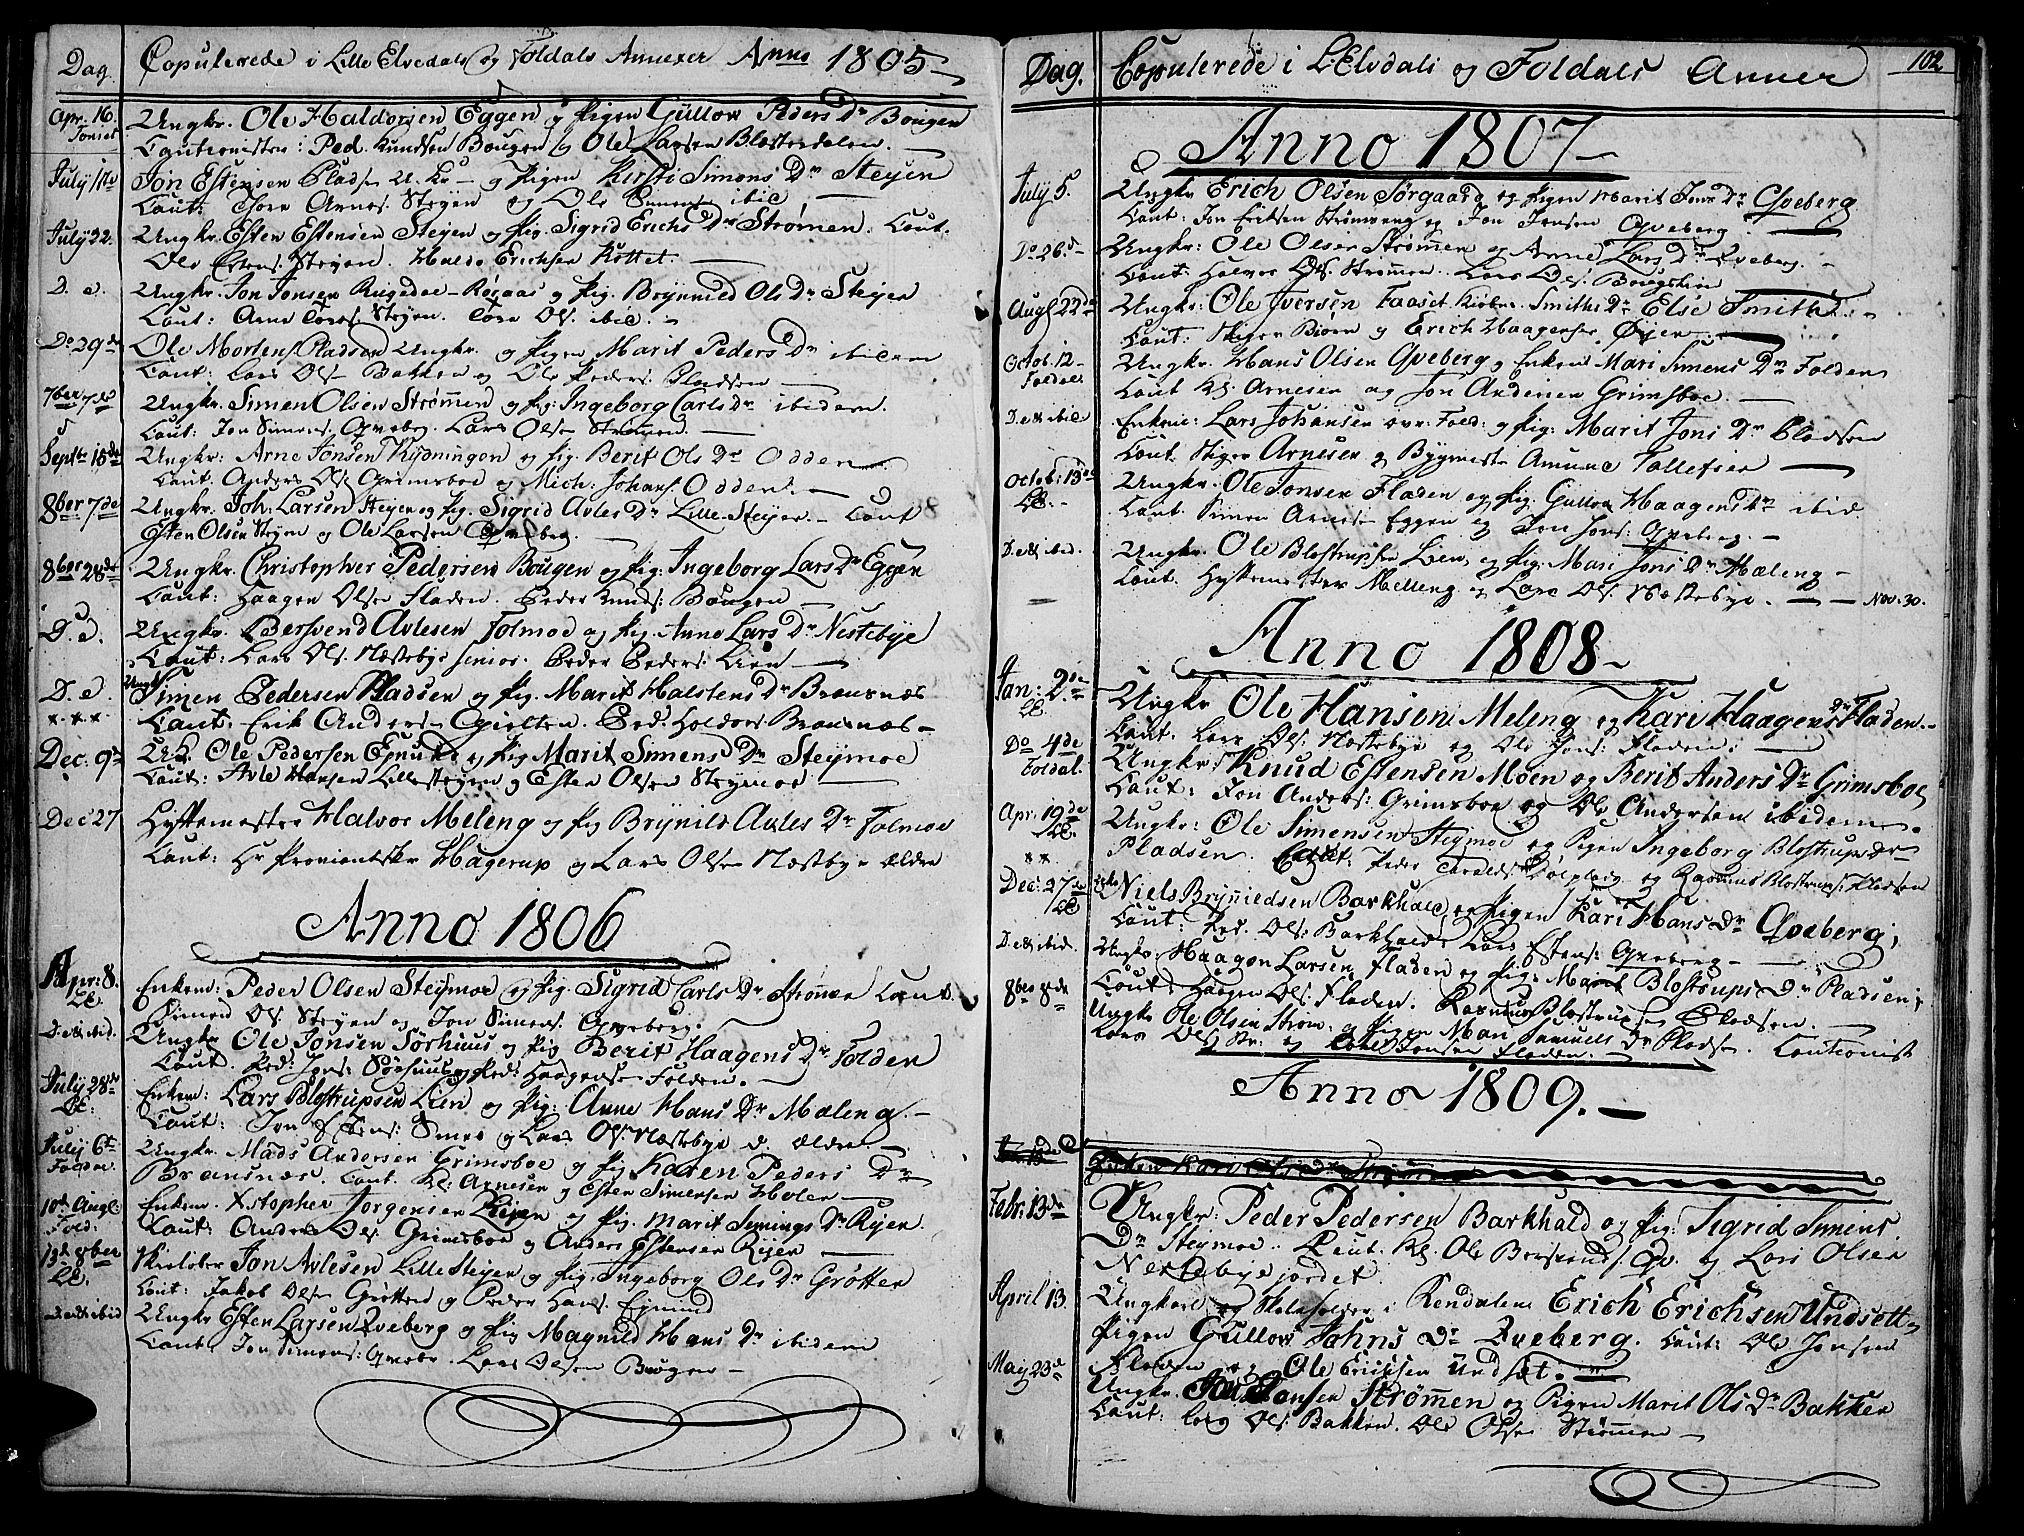 SAH, Tynset prestekontor, Ministerialbok nr. 16, 1801-1814, s. 102